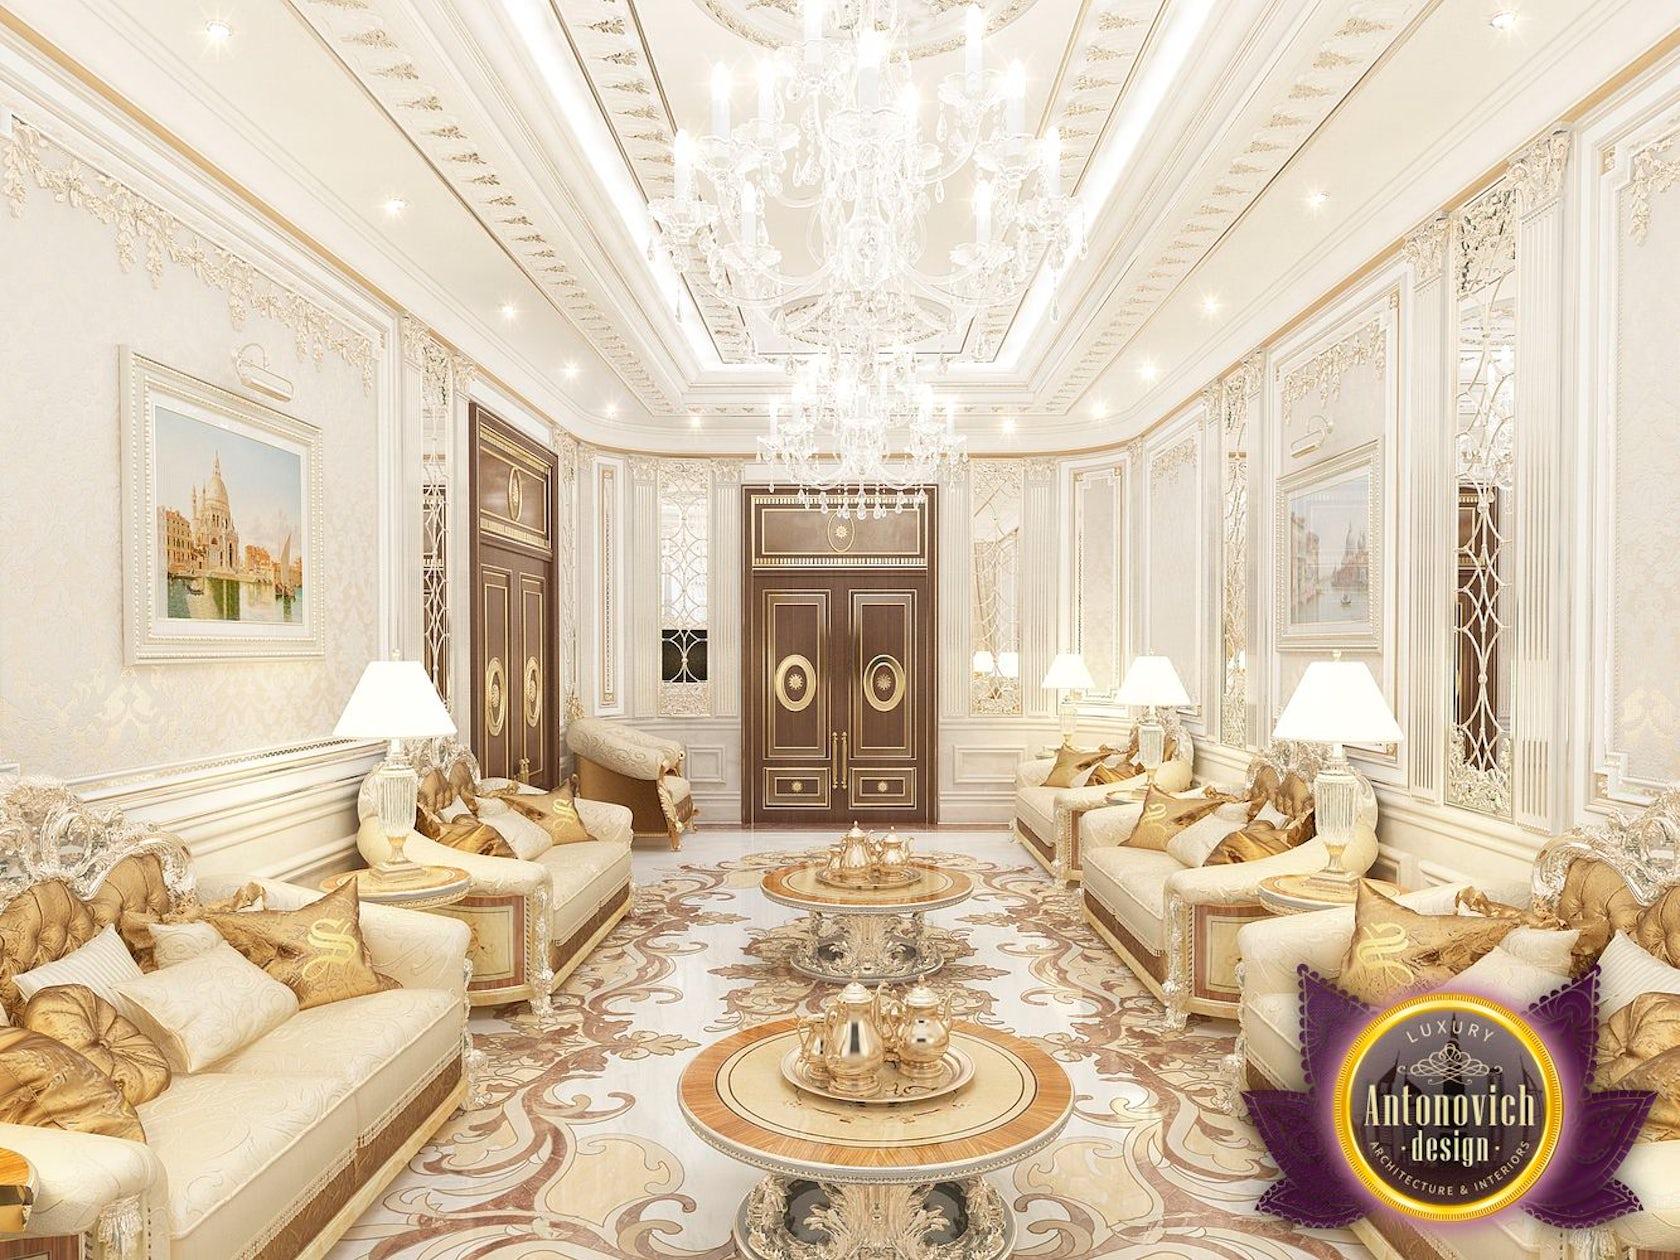 Living room interior design by luxury antonovich design - Living room designs images ...